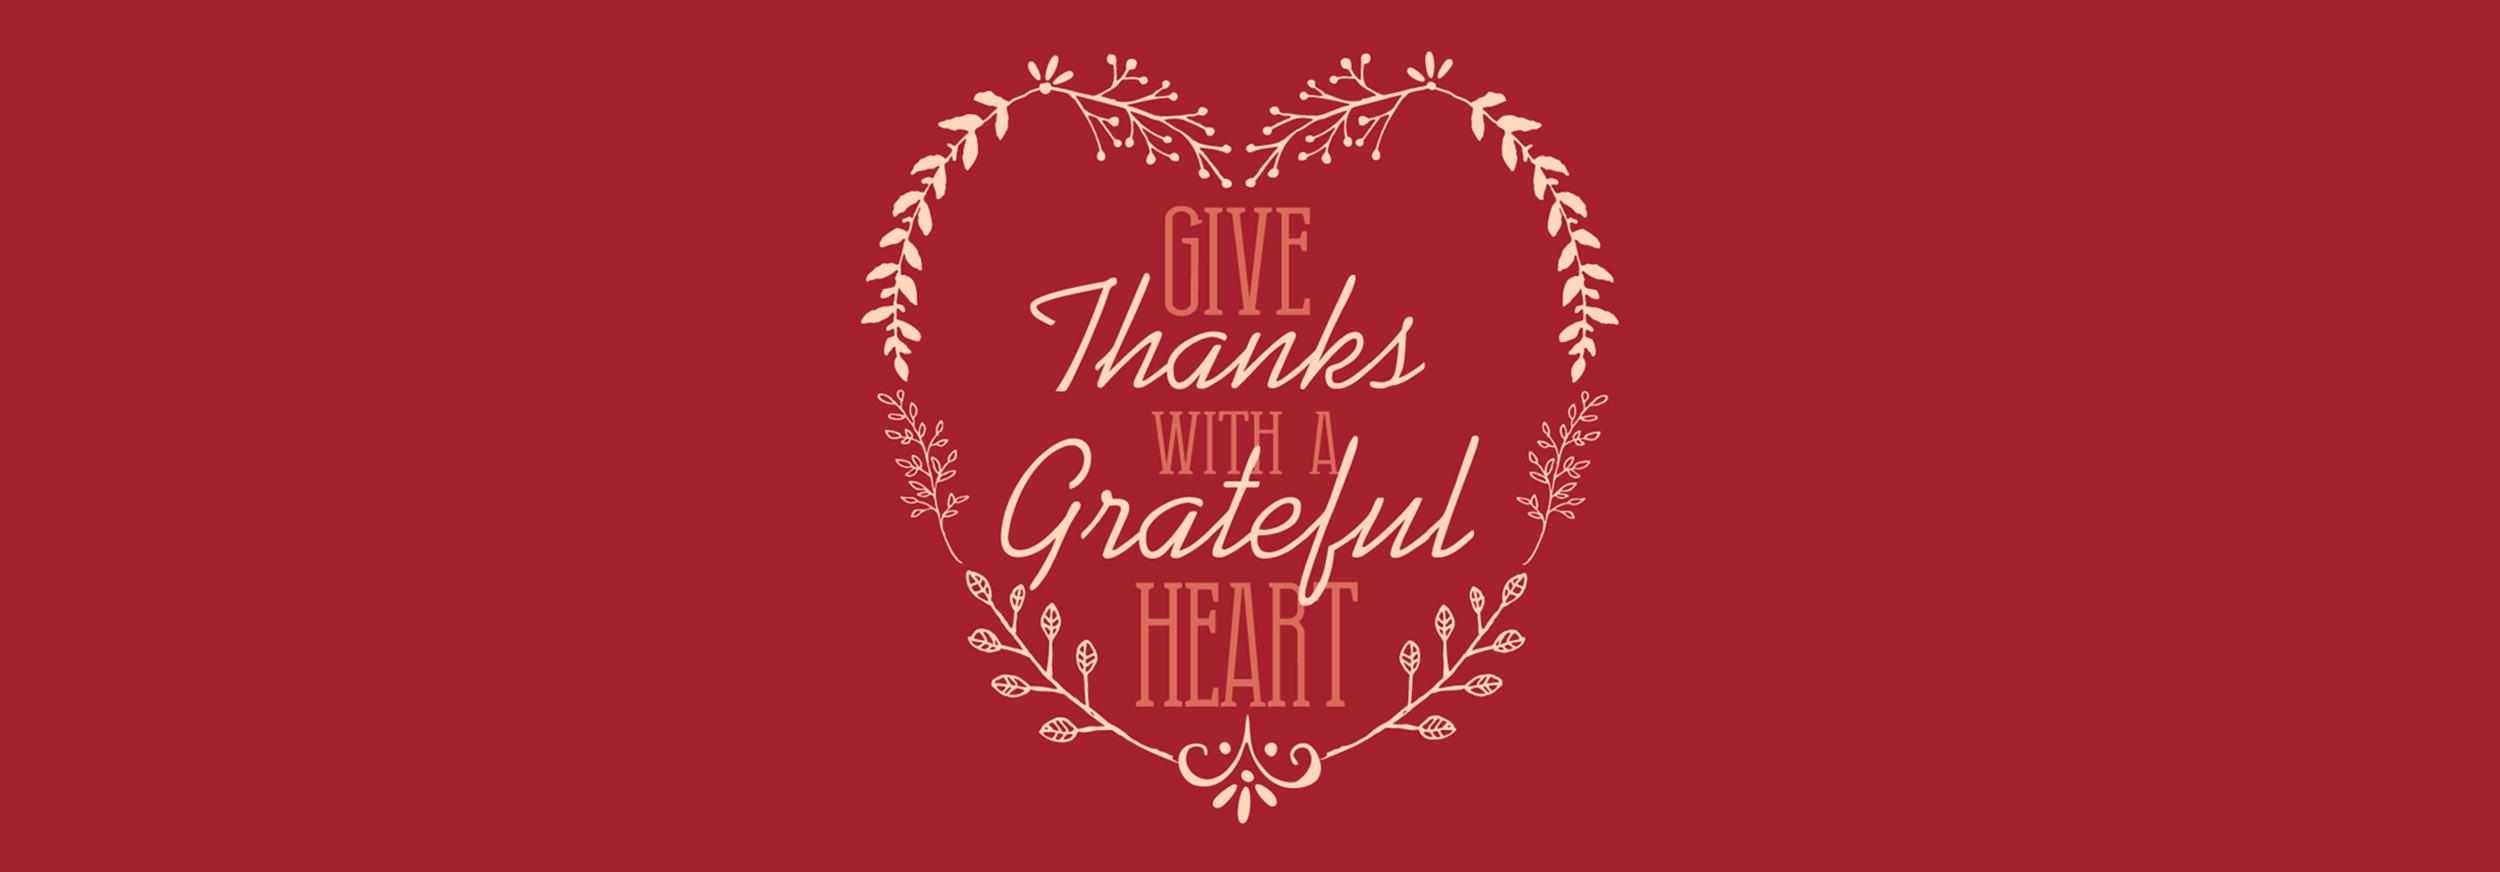 ThanksgivingService_2017_web.png